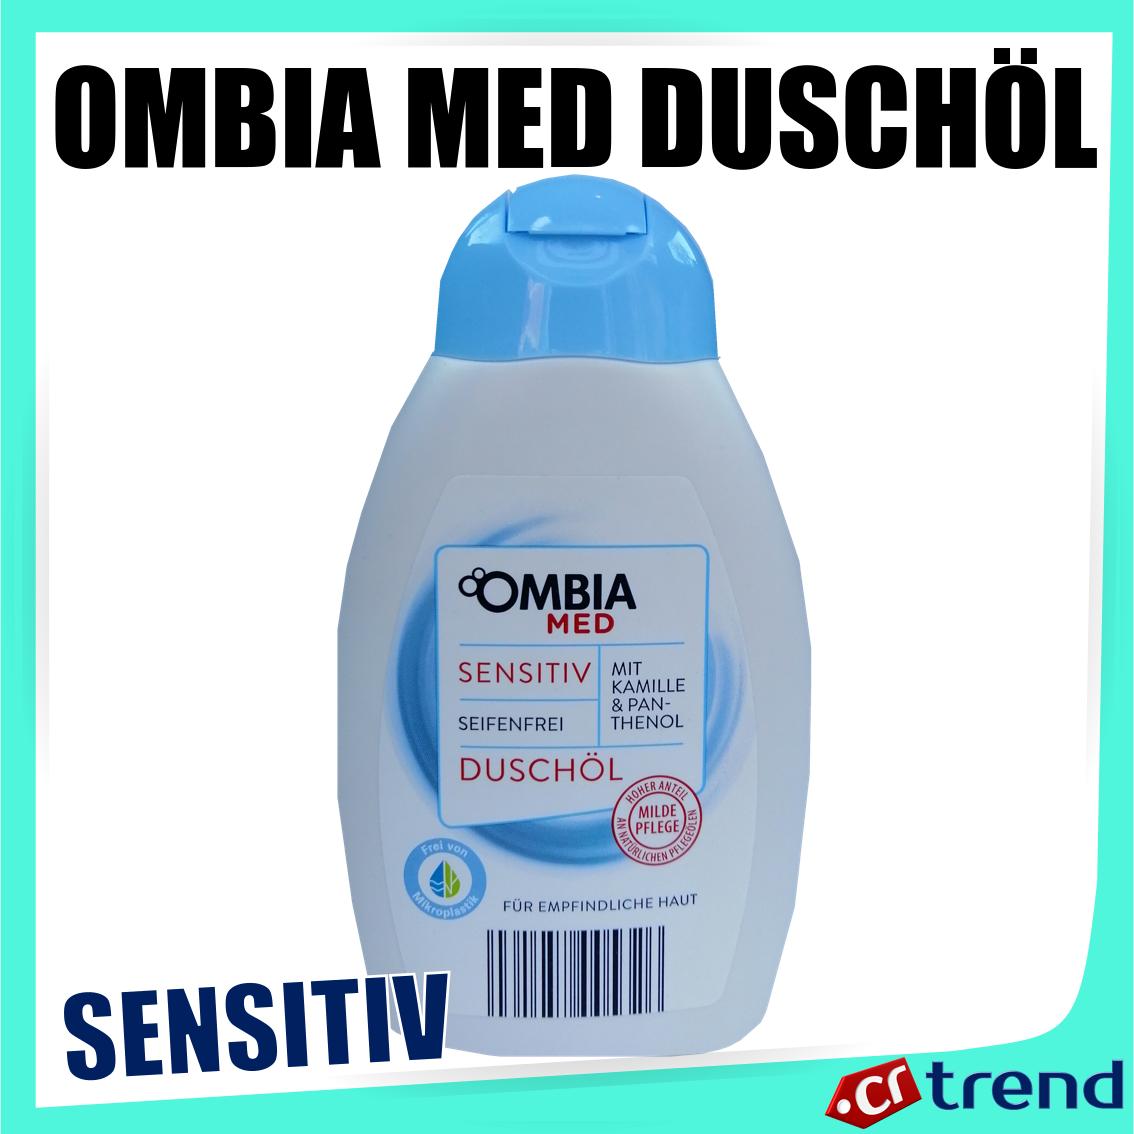 Ombia Med Duschöl: Sensitive - Vegan, mit Kamille & Panthenol 300ml